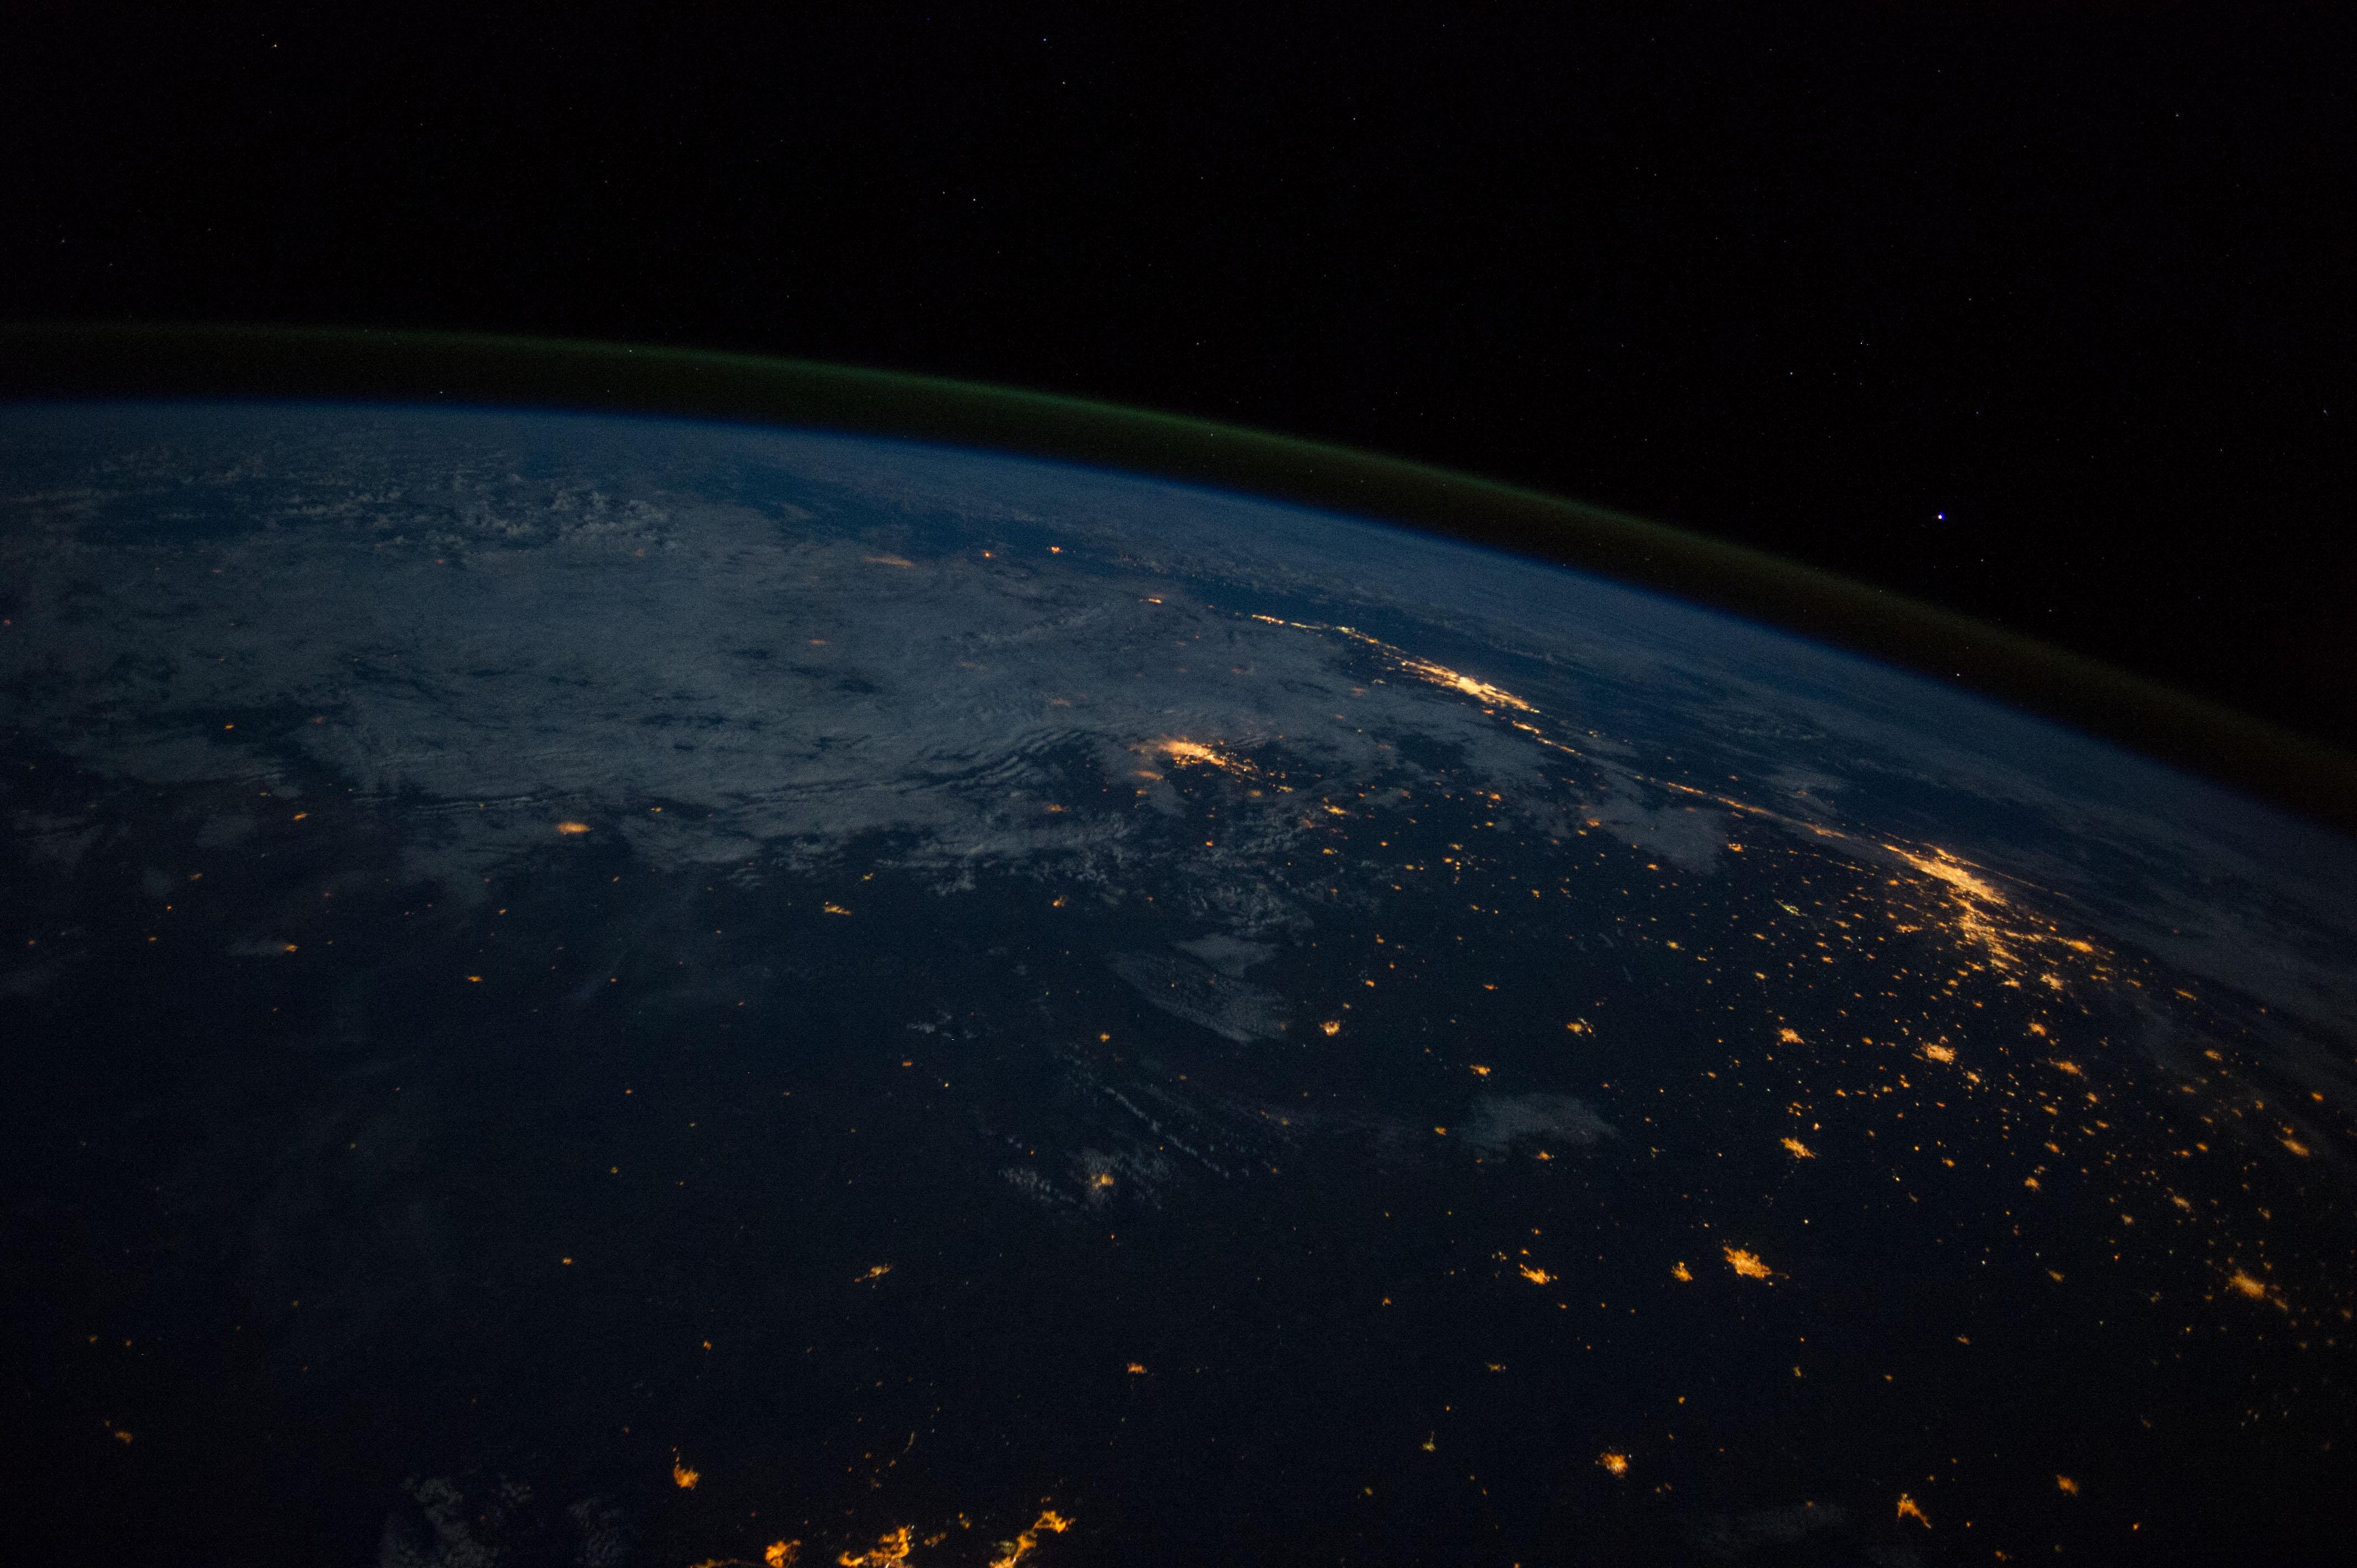 space station nasa - photo #33